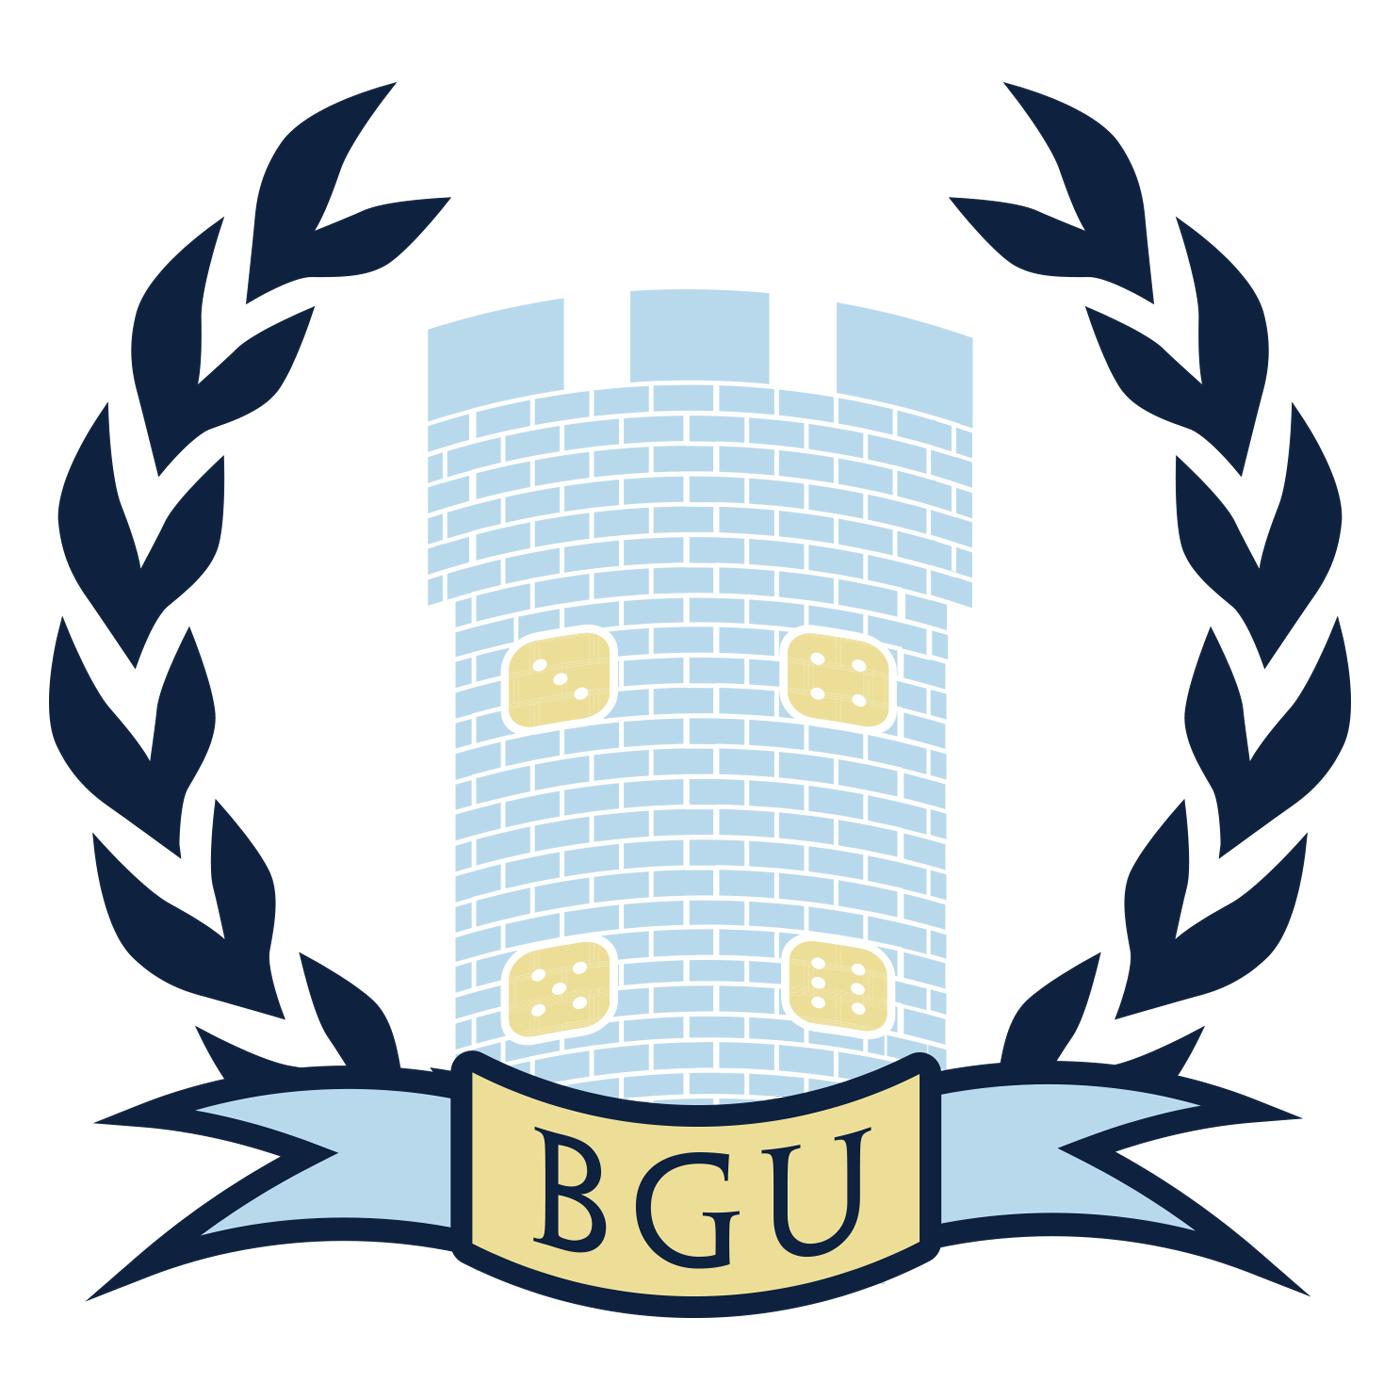 Board Game University logo